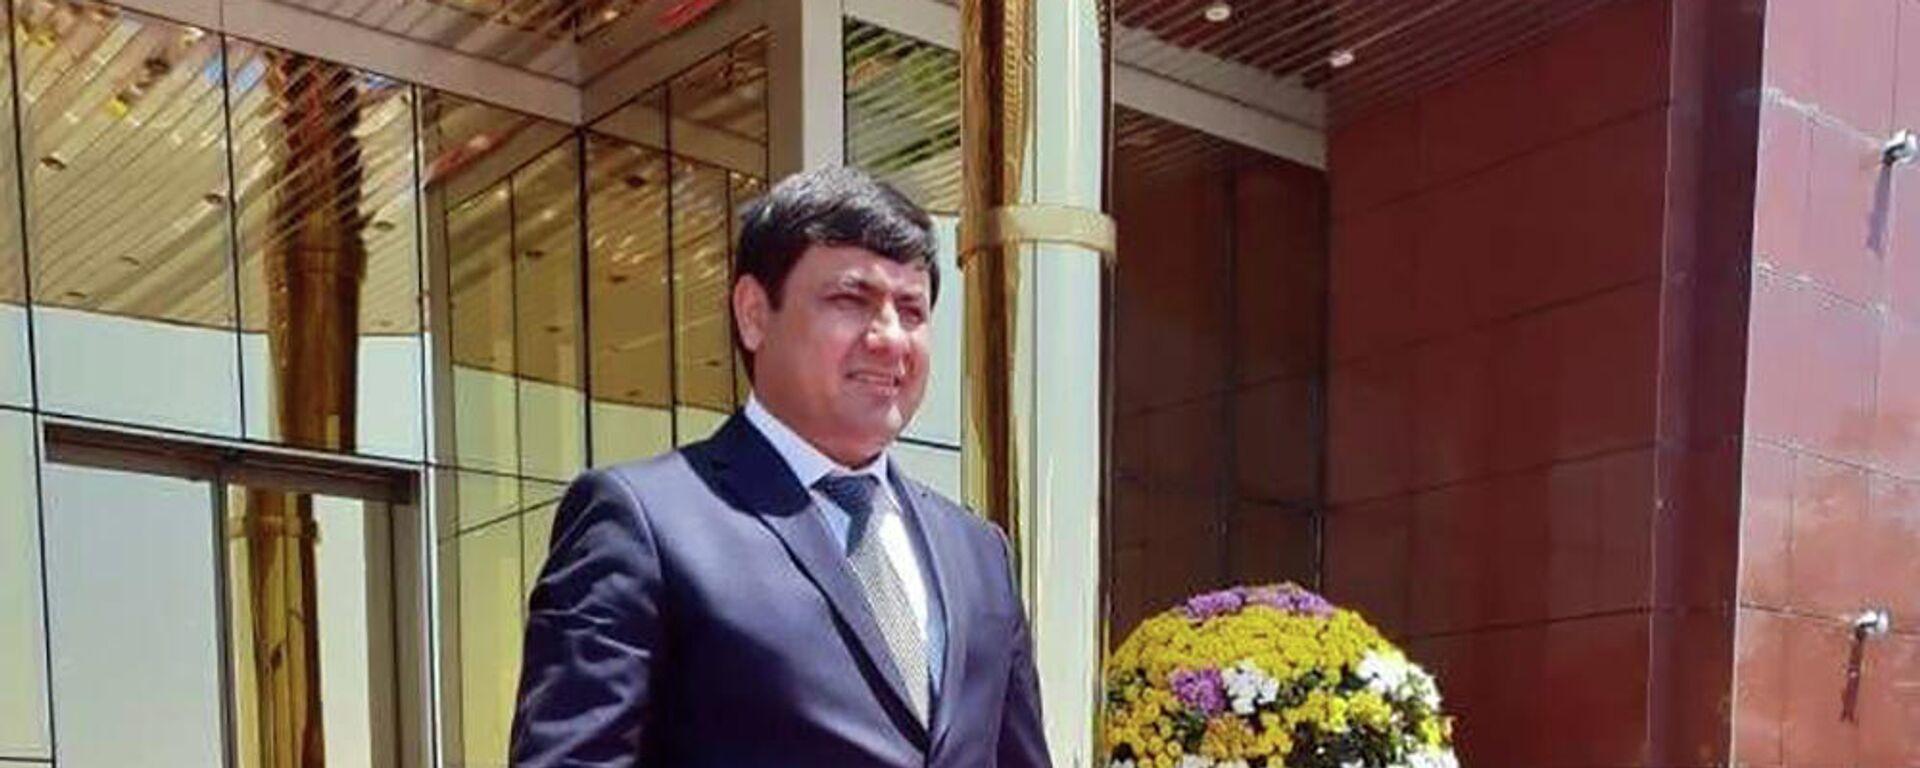 Джамшед Джахонгирзода - Sputnik Таджикистан, 1920, 01.07.2021